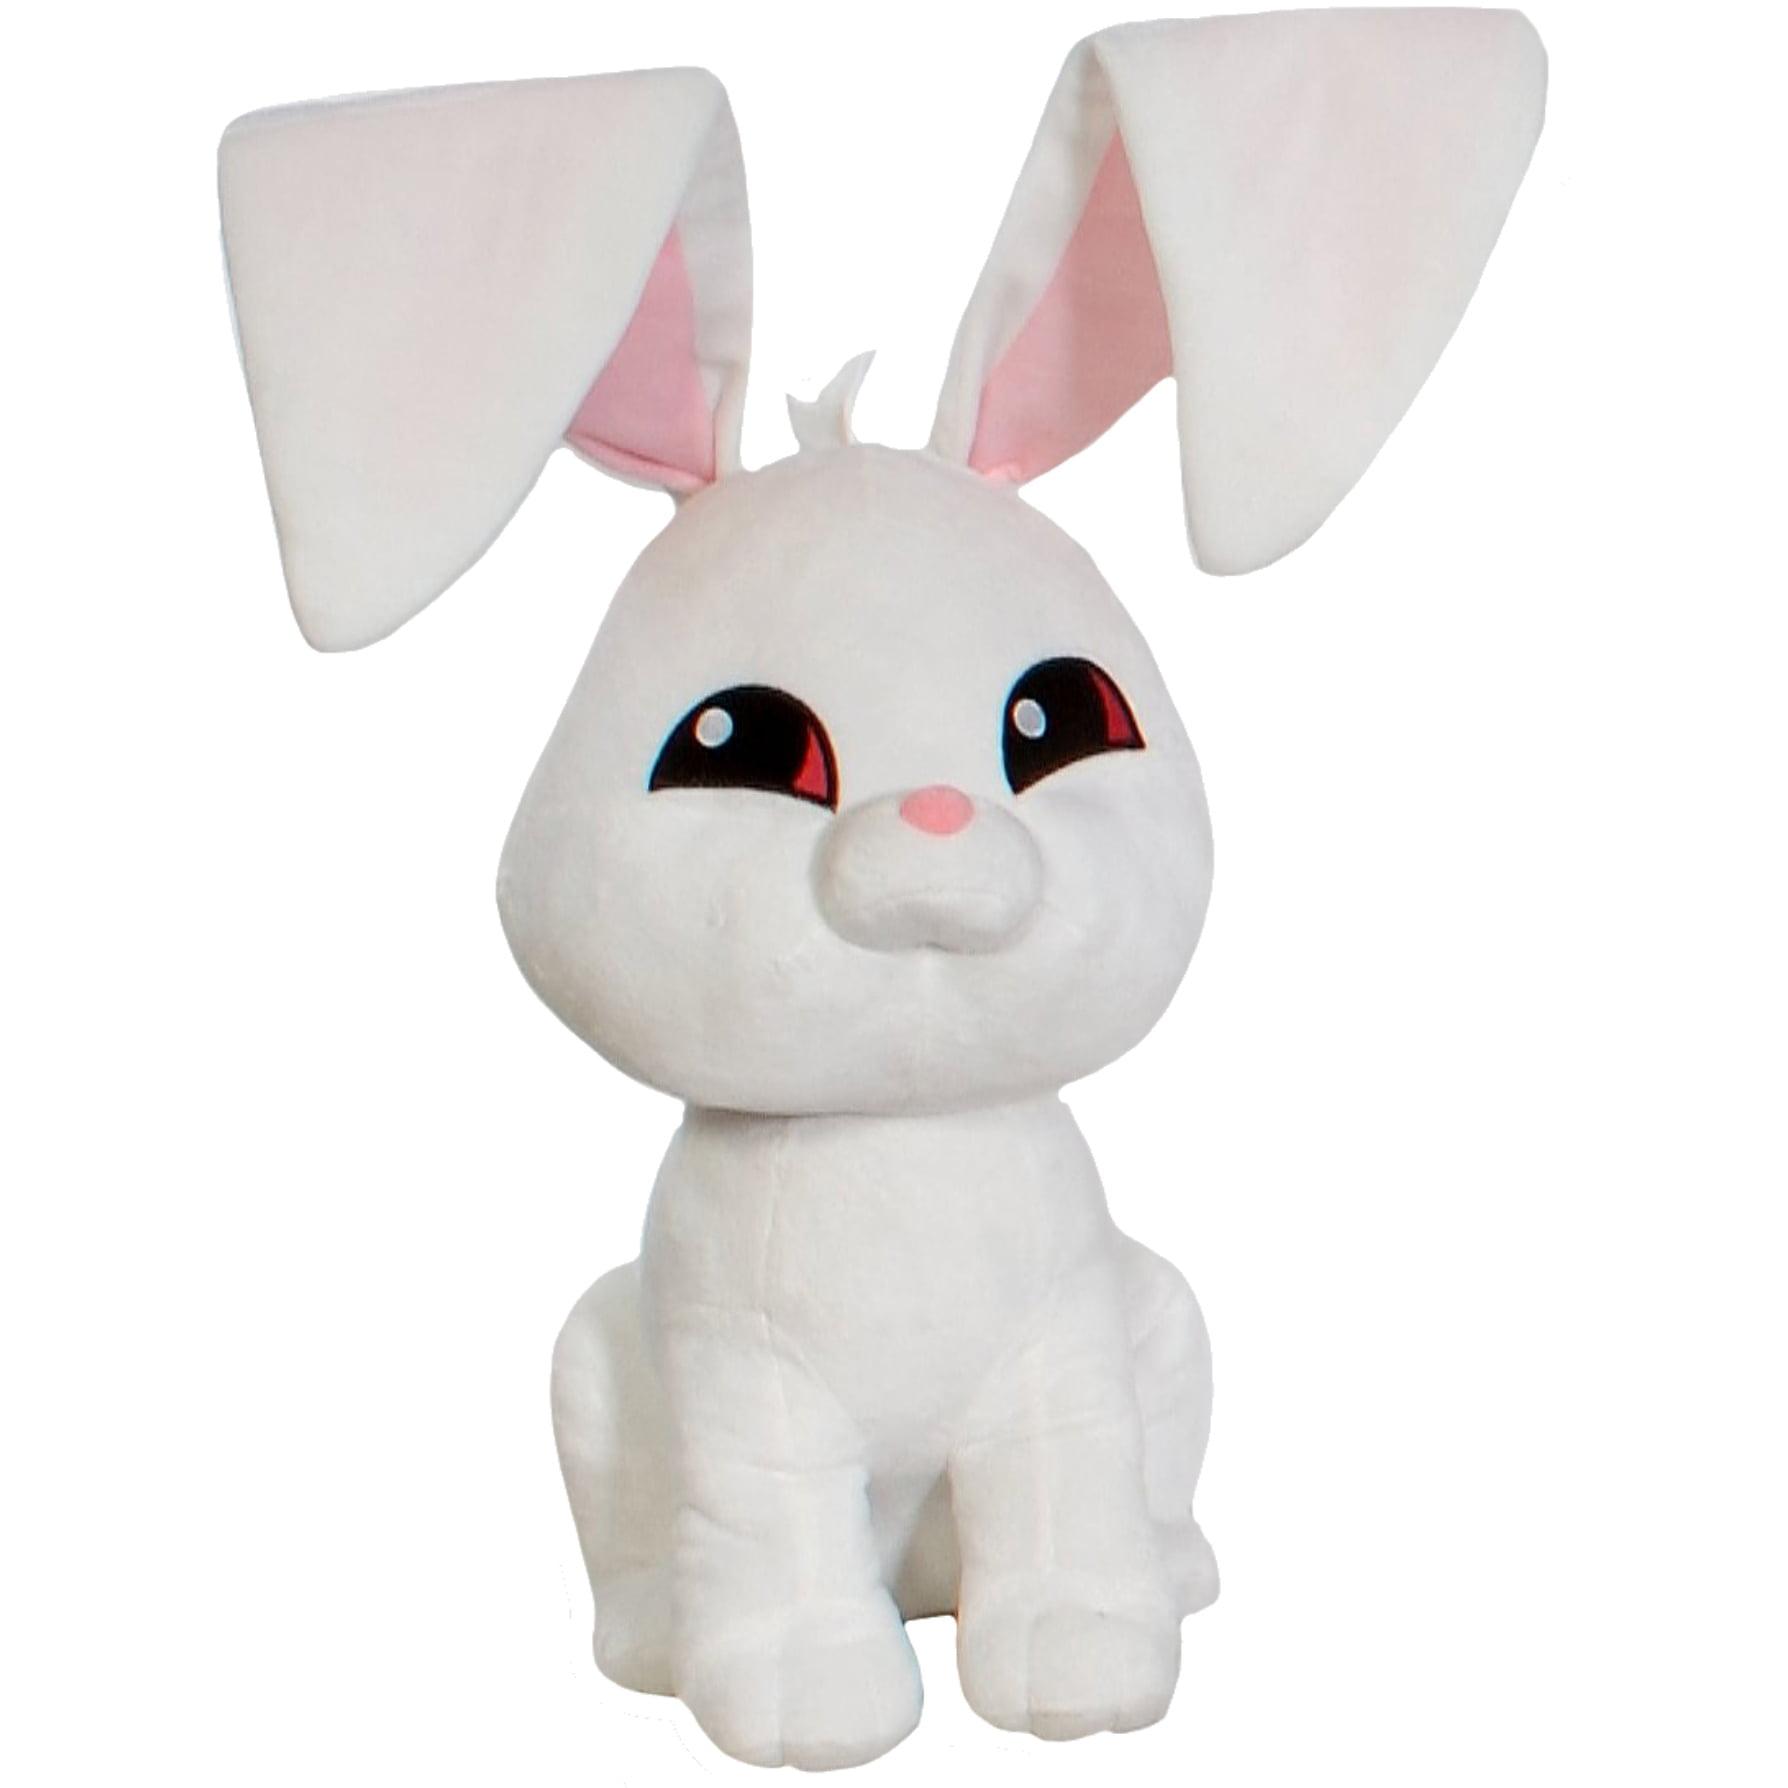 Animal Jam 14 Inch Plush White Bunny By Fiesta Walmart Com